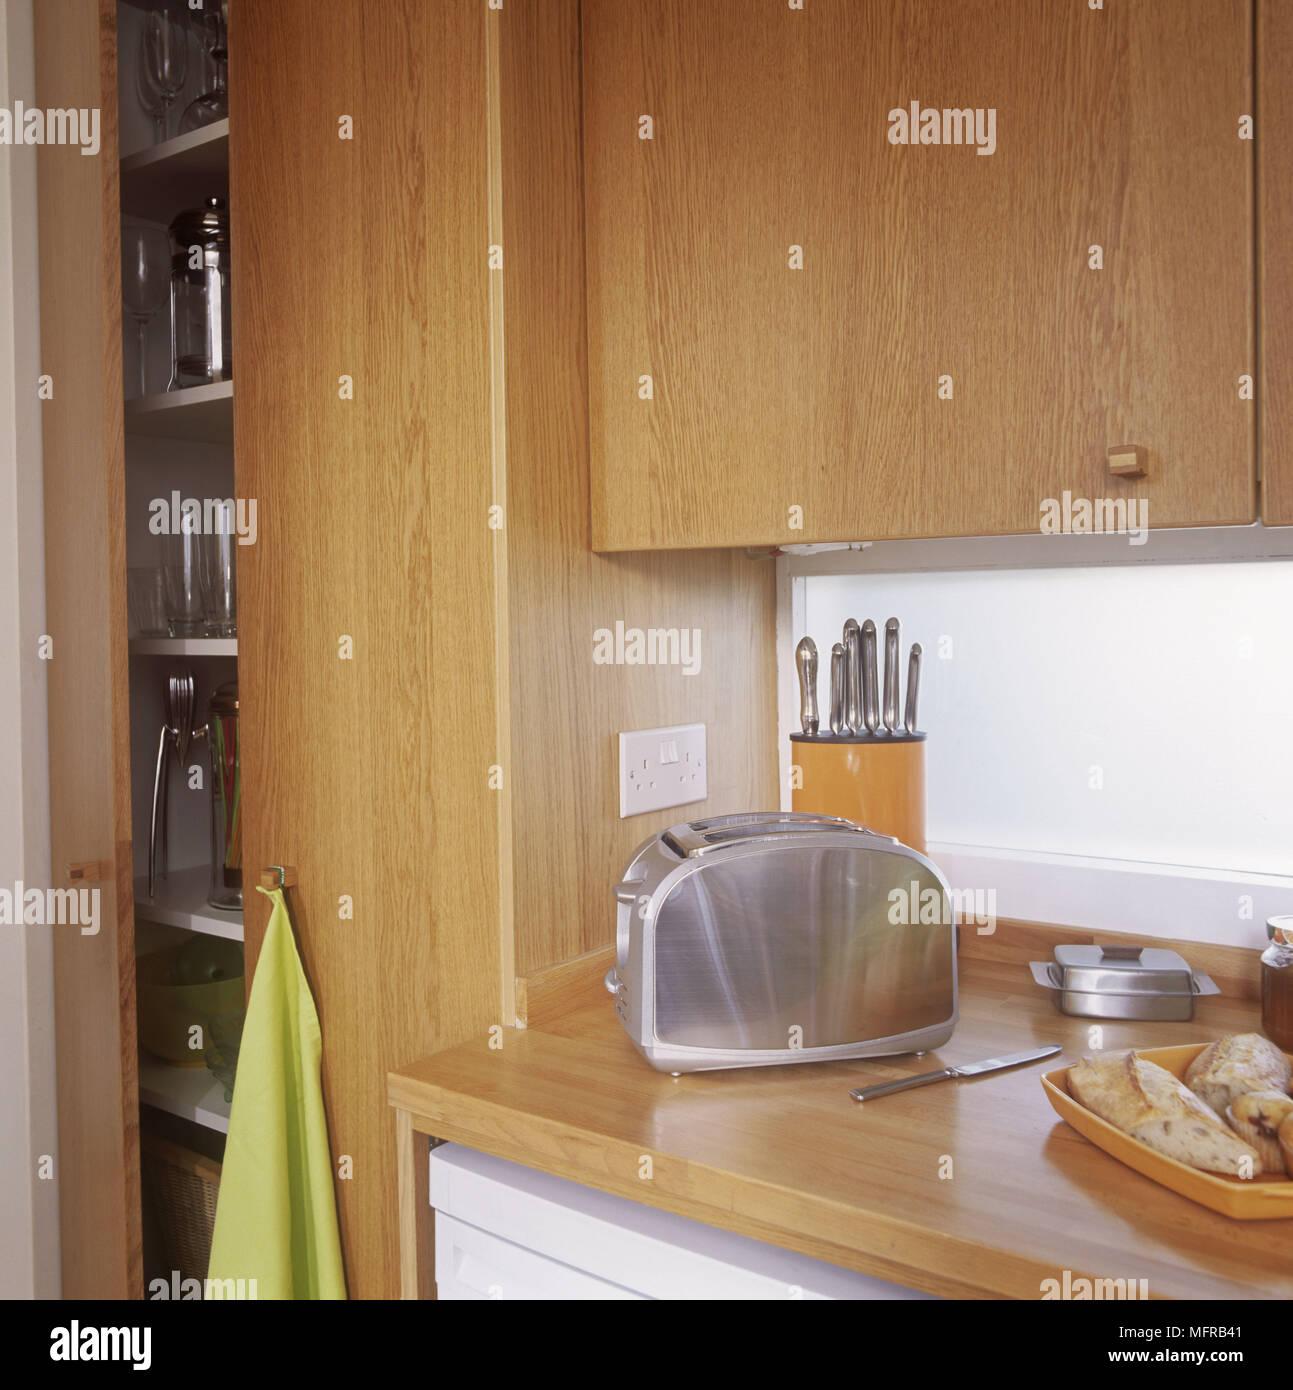 Holz  Arbeitsplatte Und Schränke Mit Edelstahlgeräten Stockbild